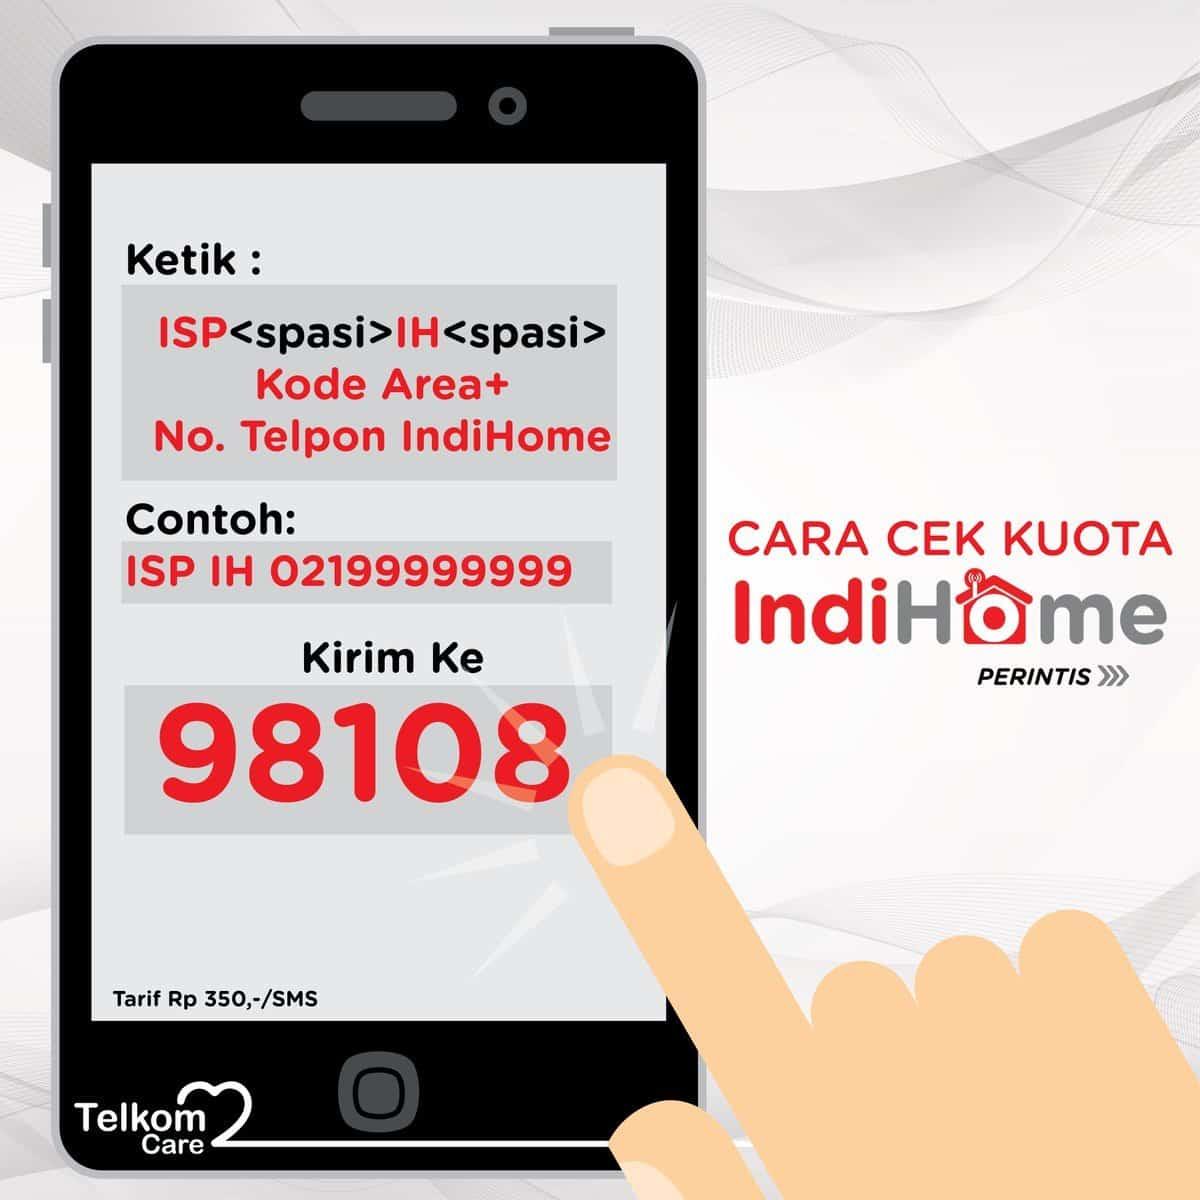 Cek Kuota Indihome Lewat SMS